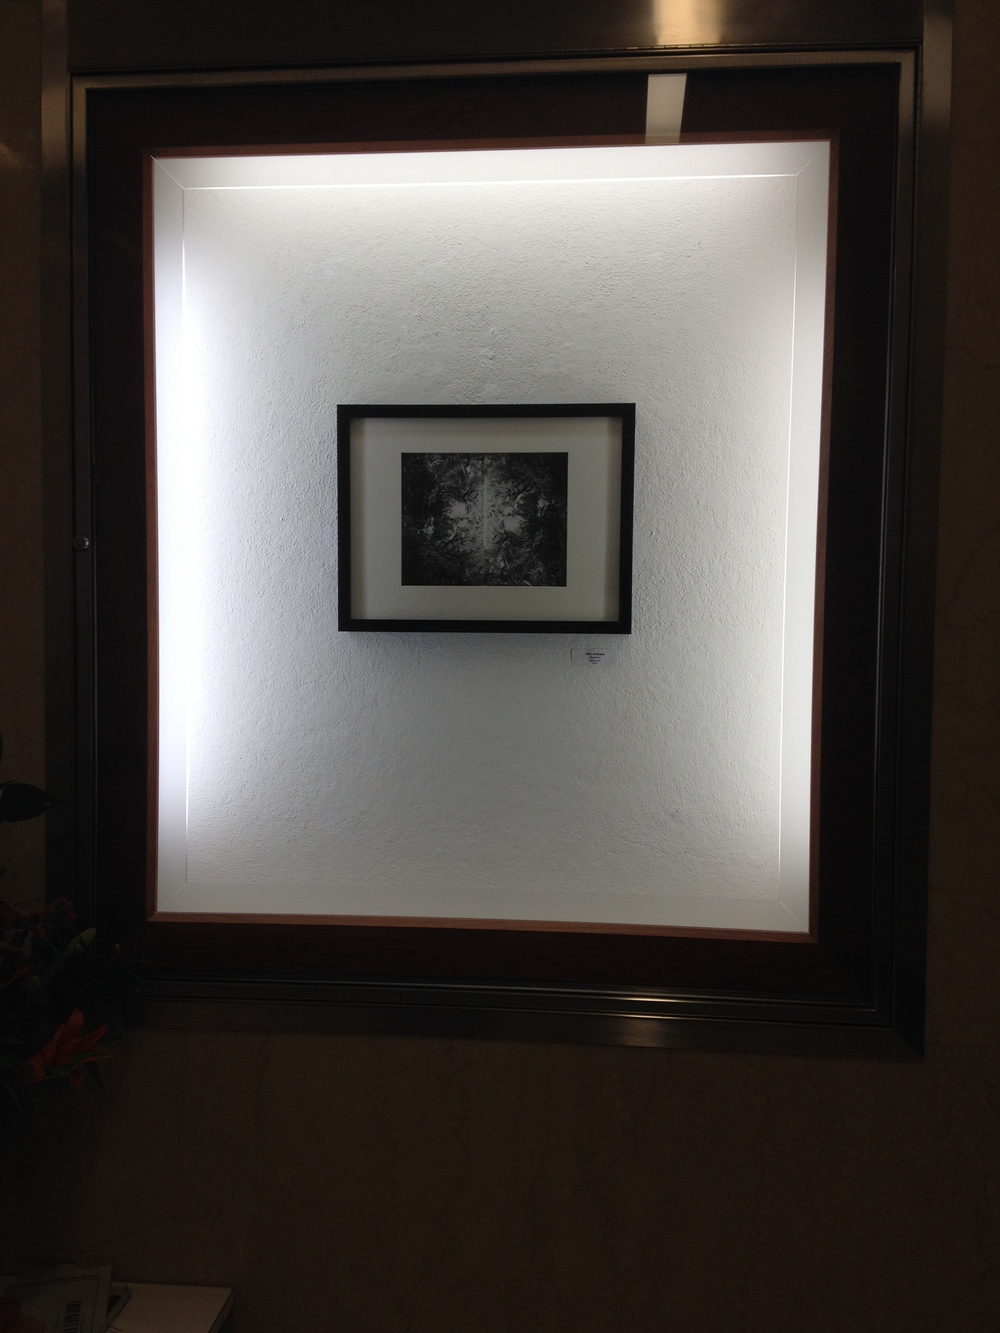 photo 2-1.JPG